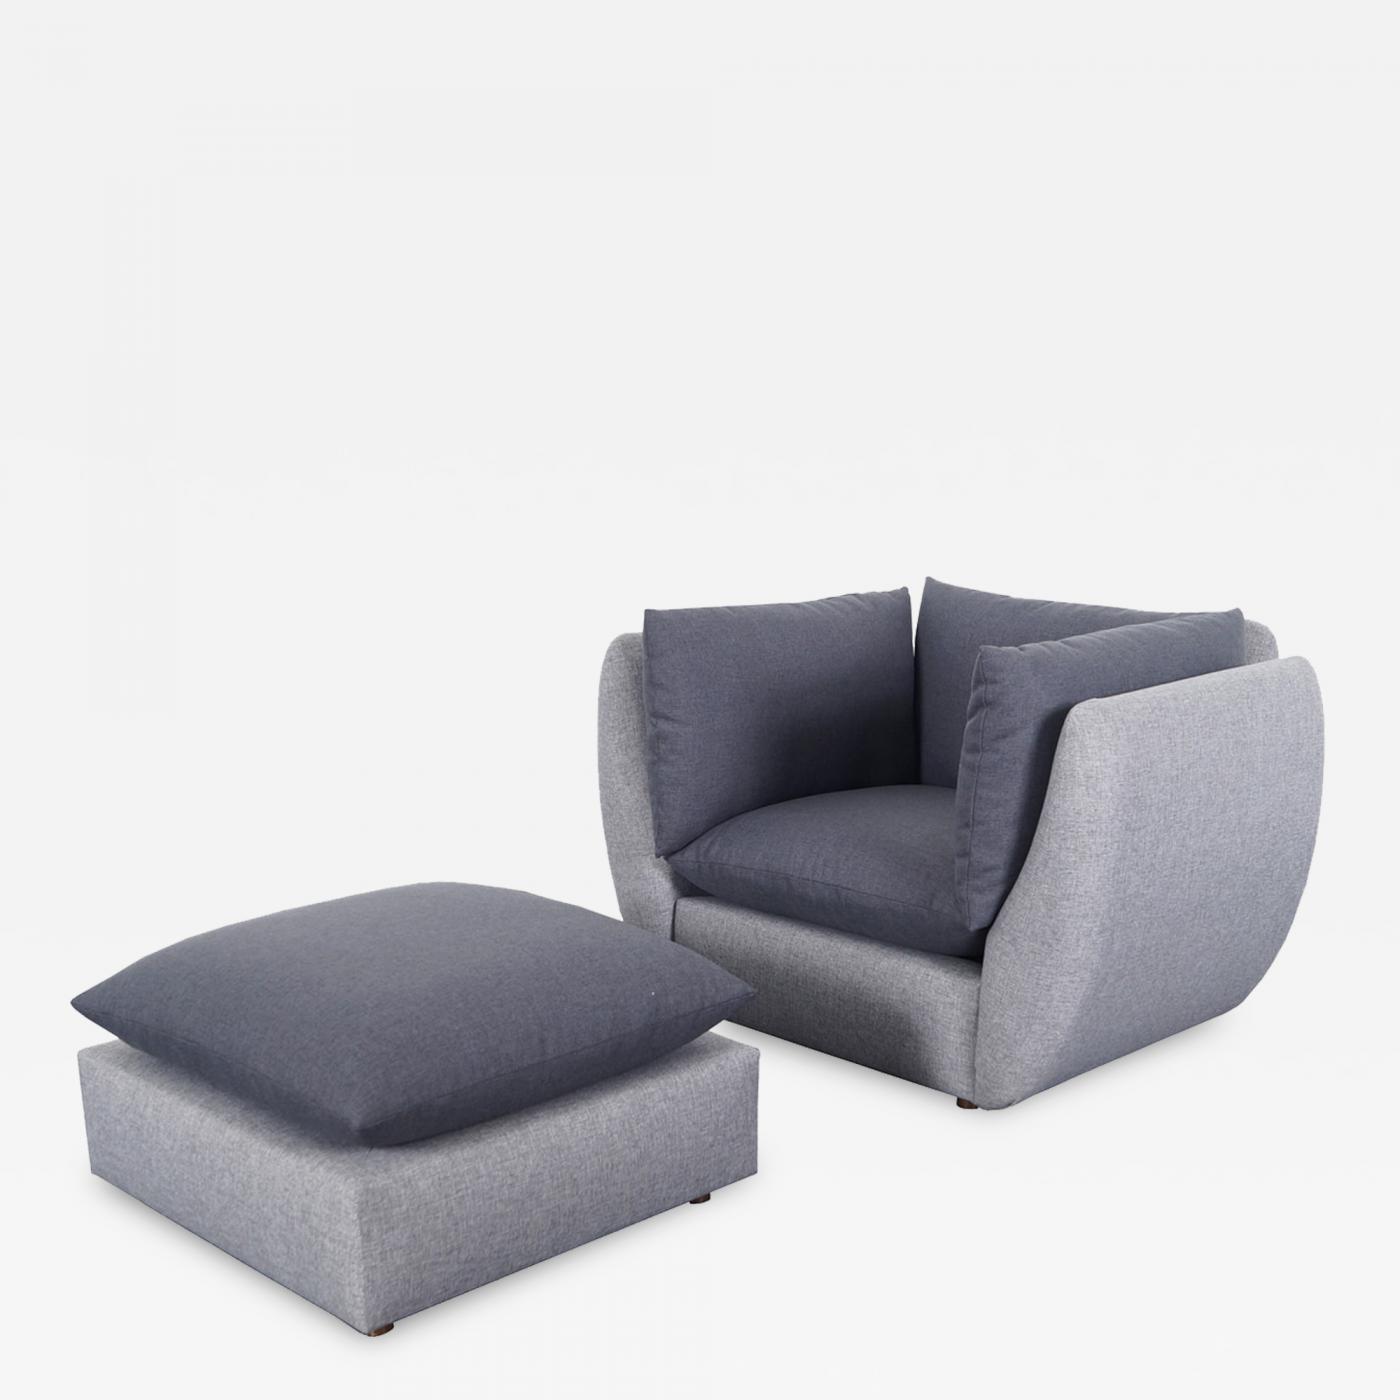 Milo Baughman Mid Century Modern Lounge Chair Ottoman